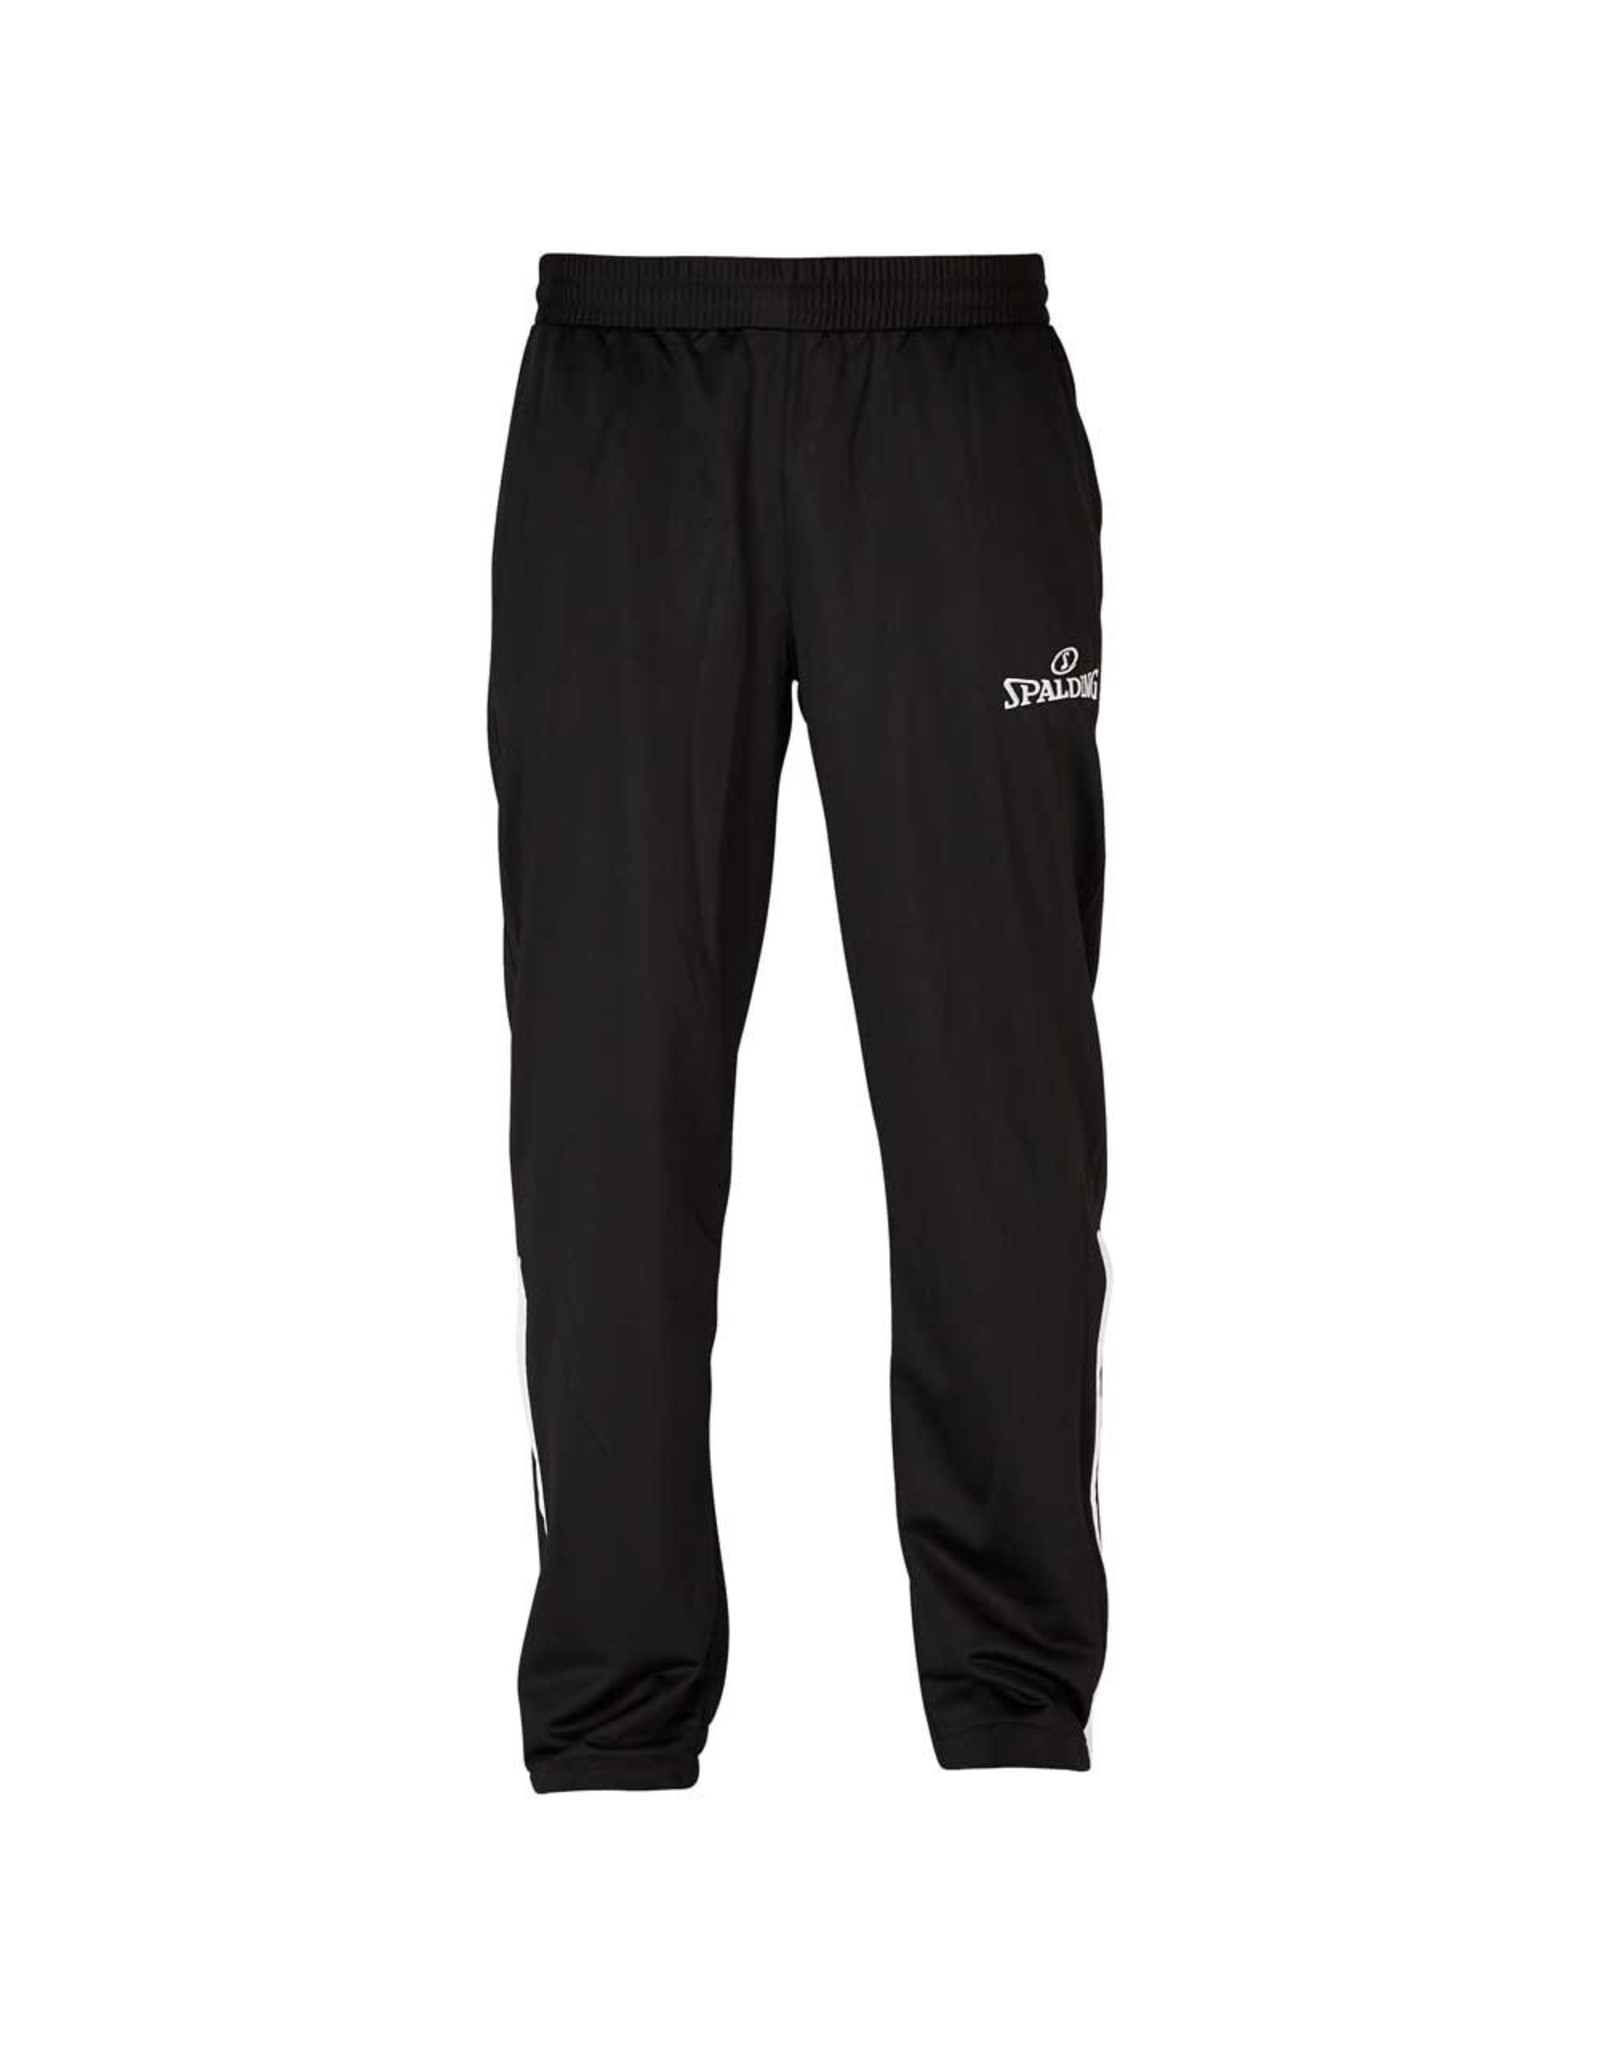 Spalding Team Warm Up Pants